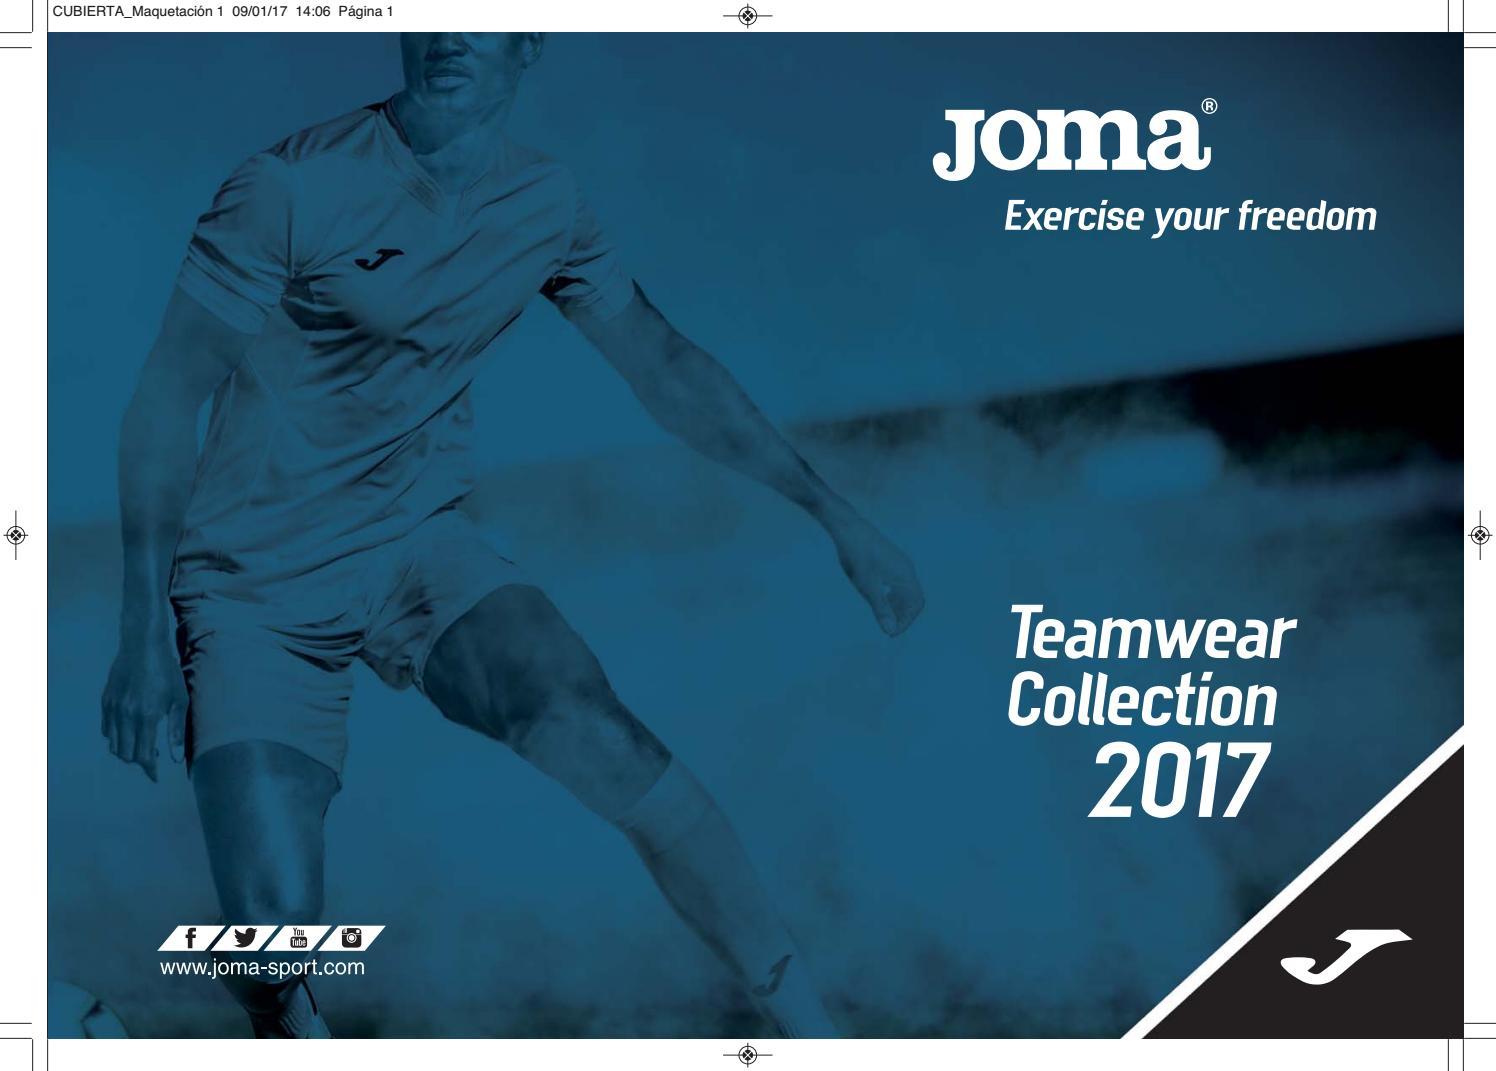 Teamwear collection 2017 Polska by K+M Sport - issuu 29c51ed1fbee5